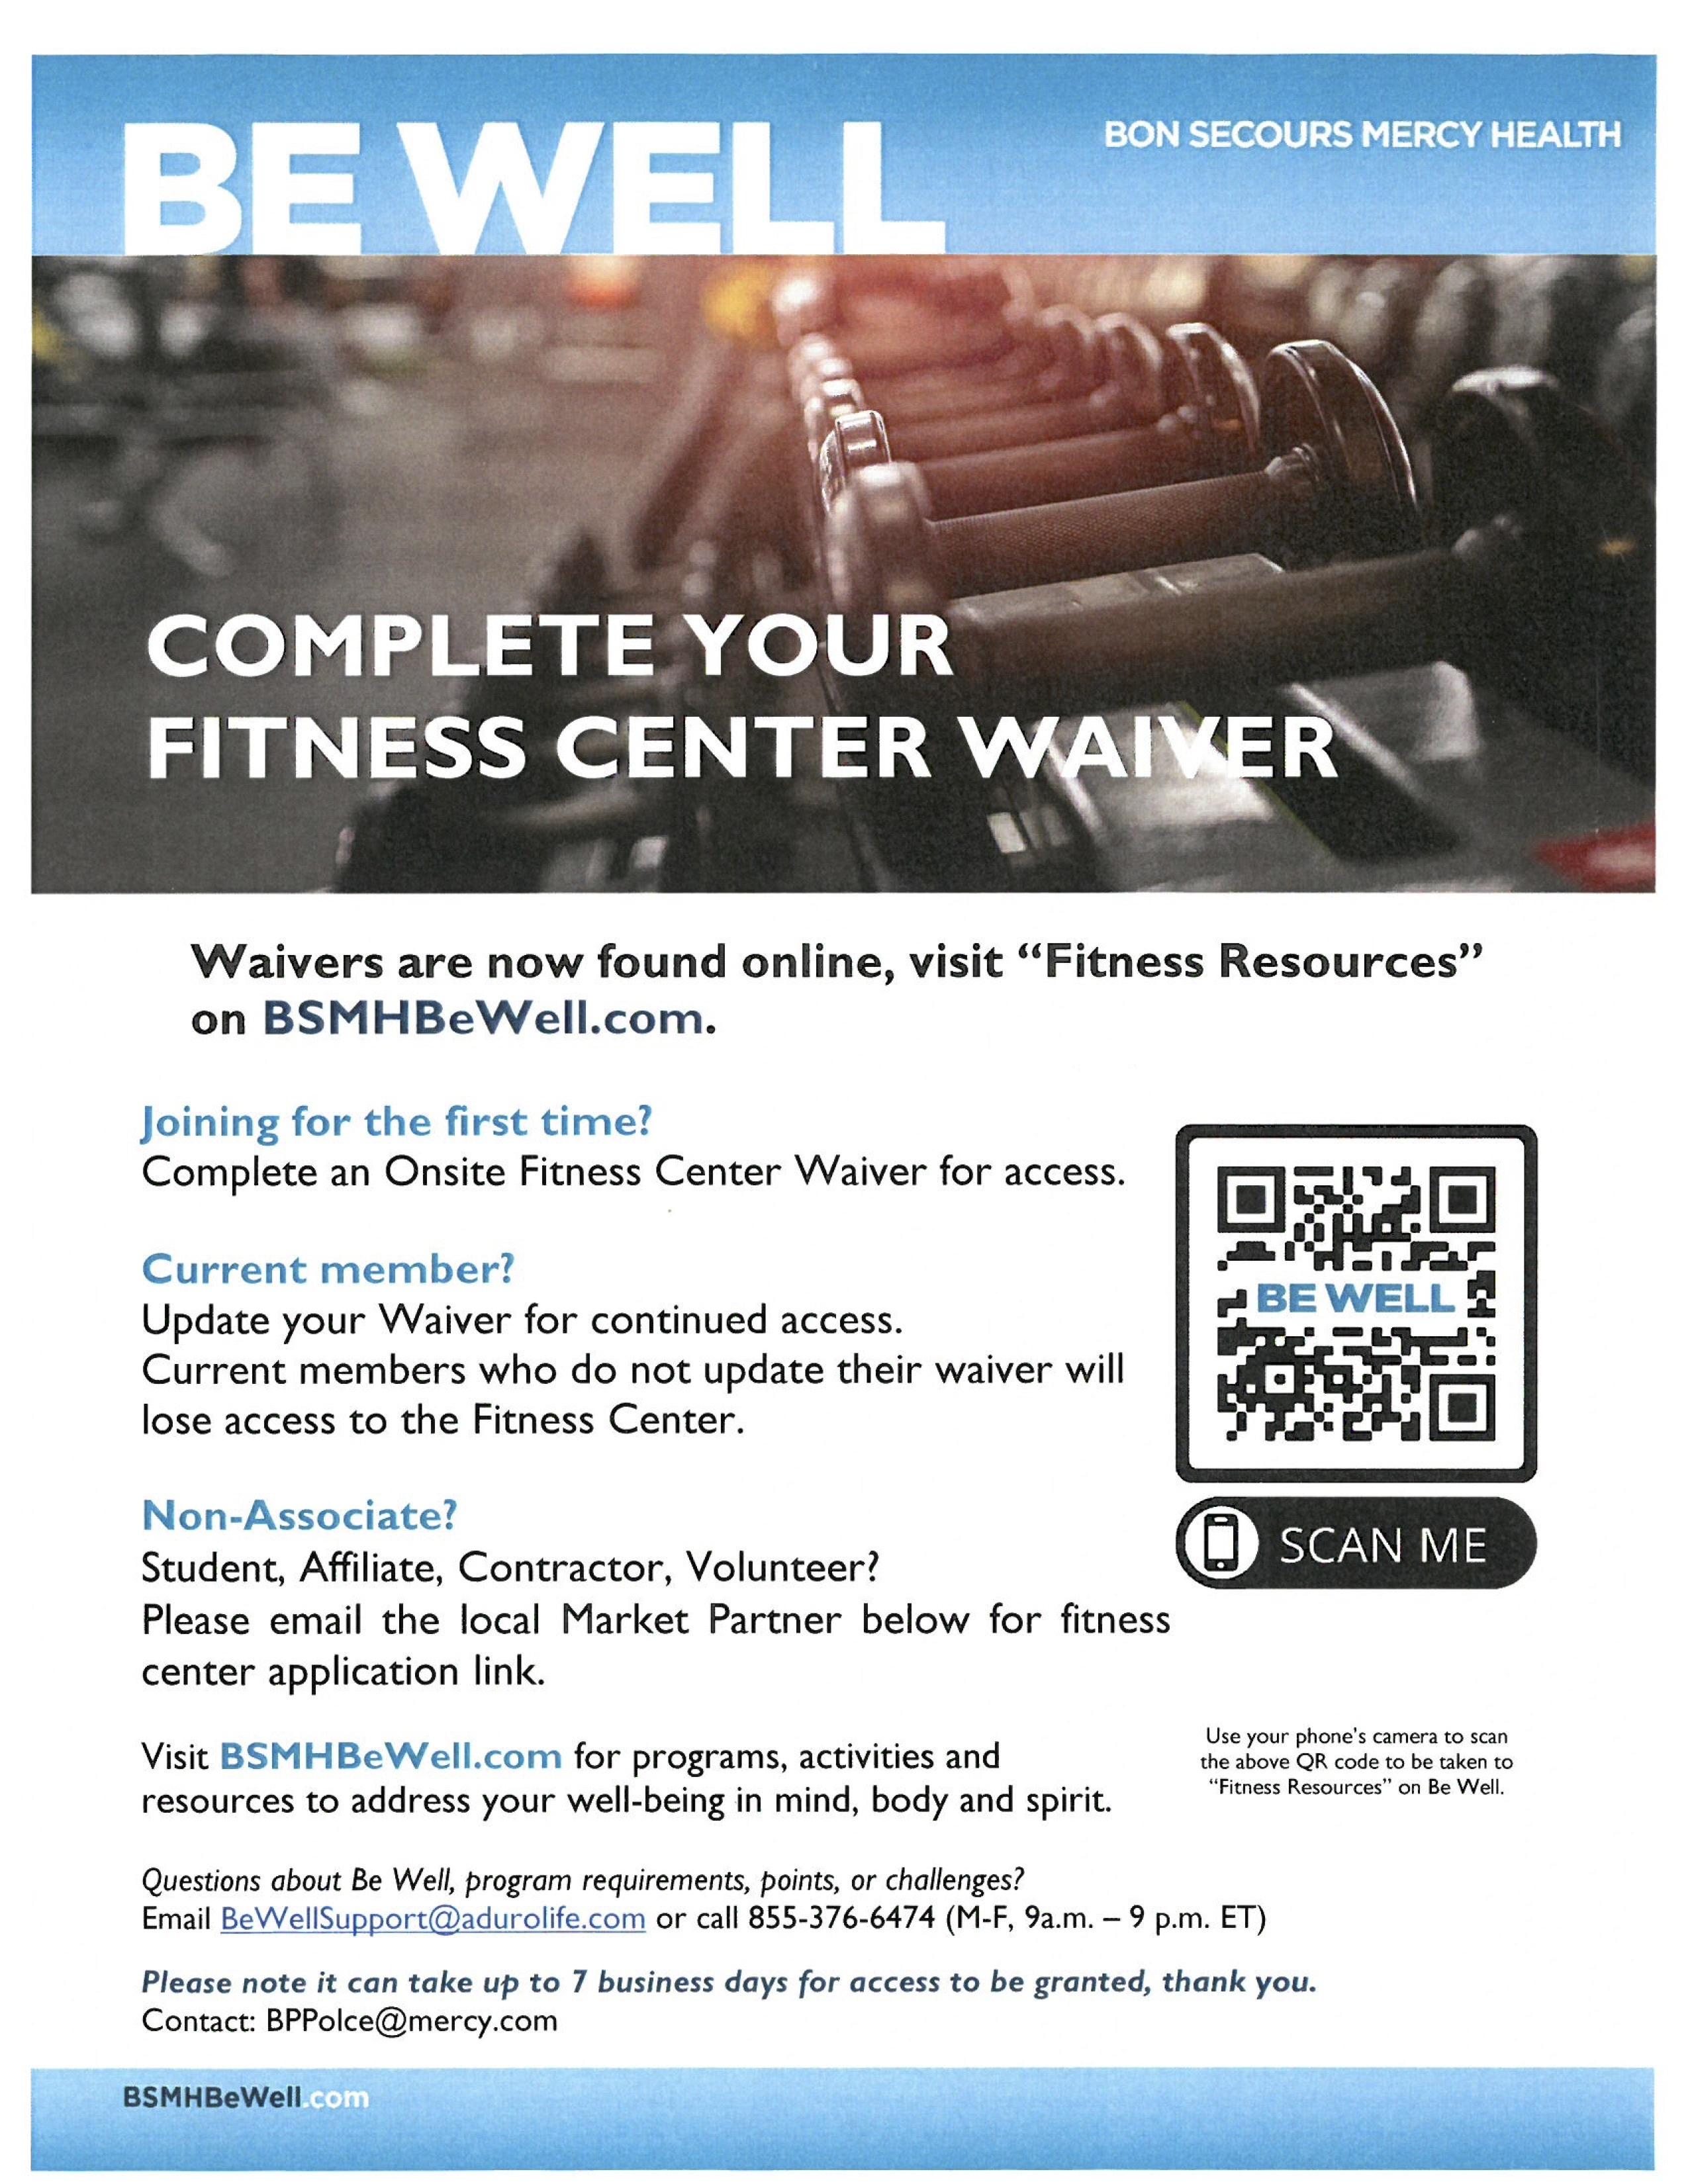 Fitness center sign up flyer